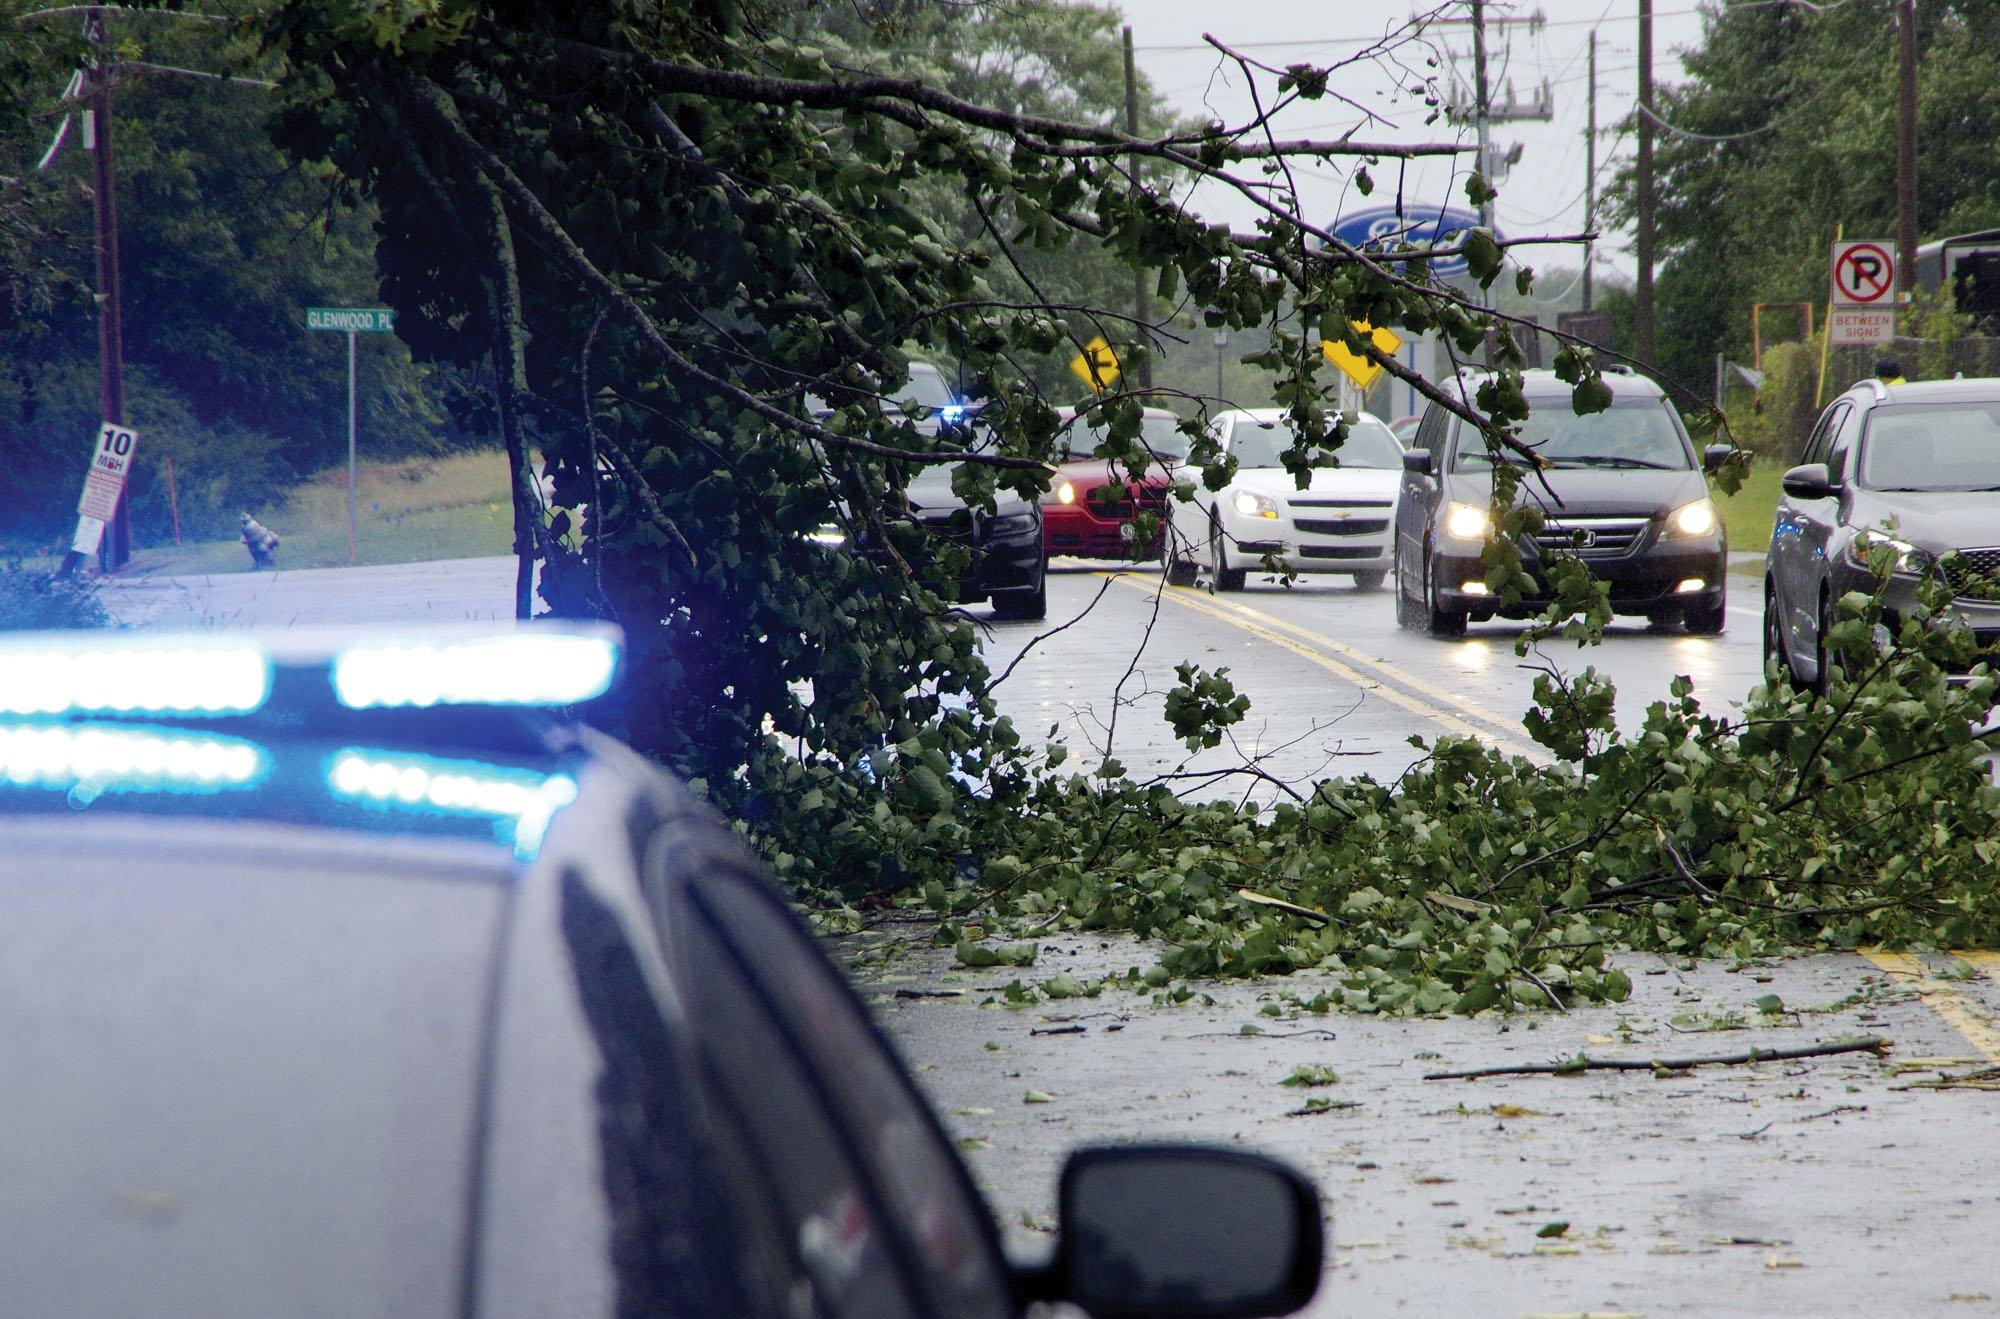 Atlanta Highway blocked at Piney Grove